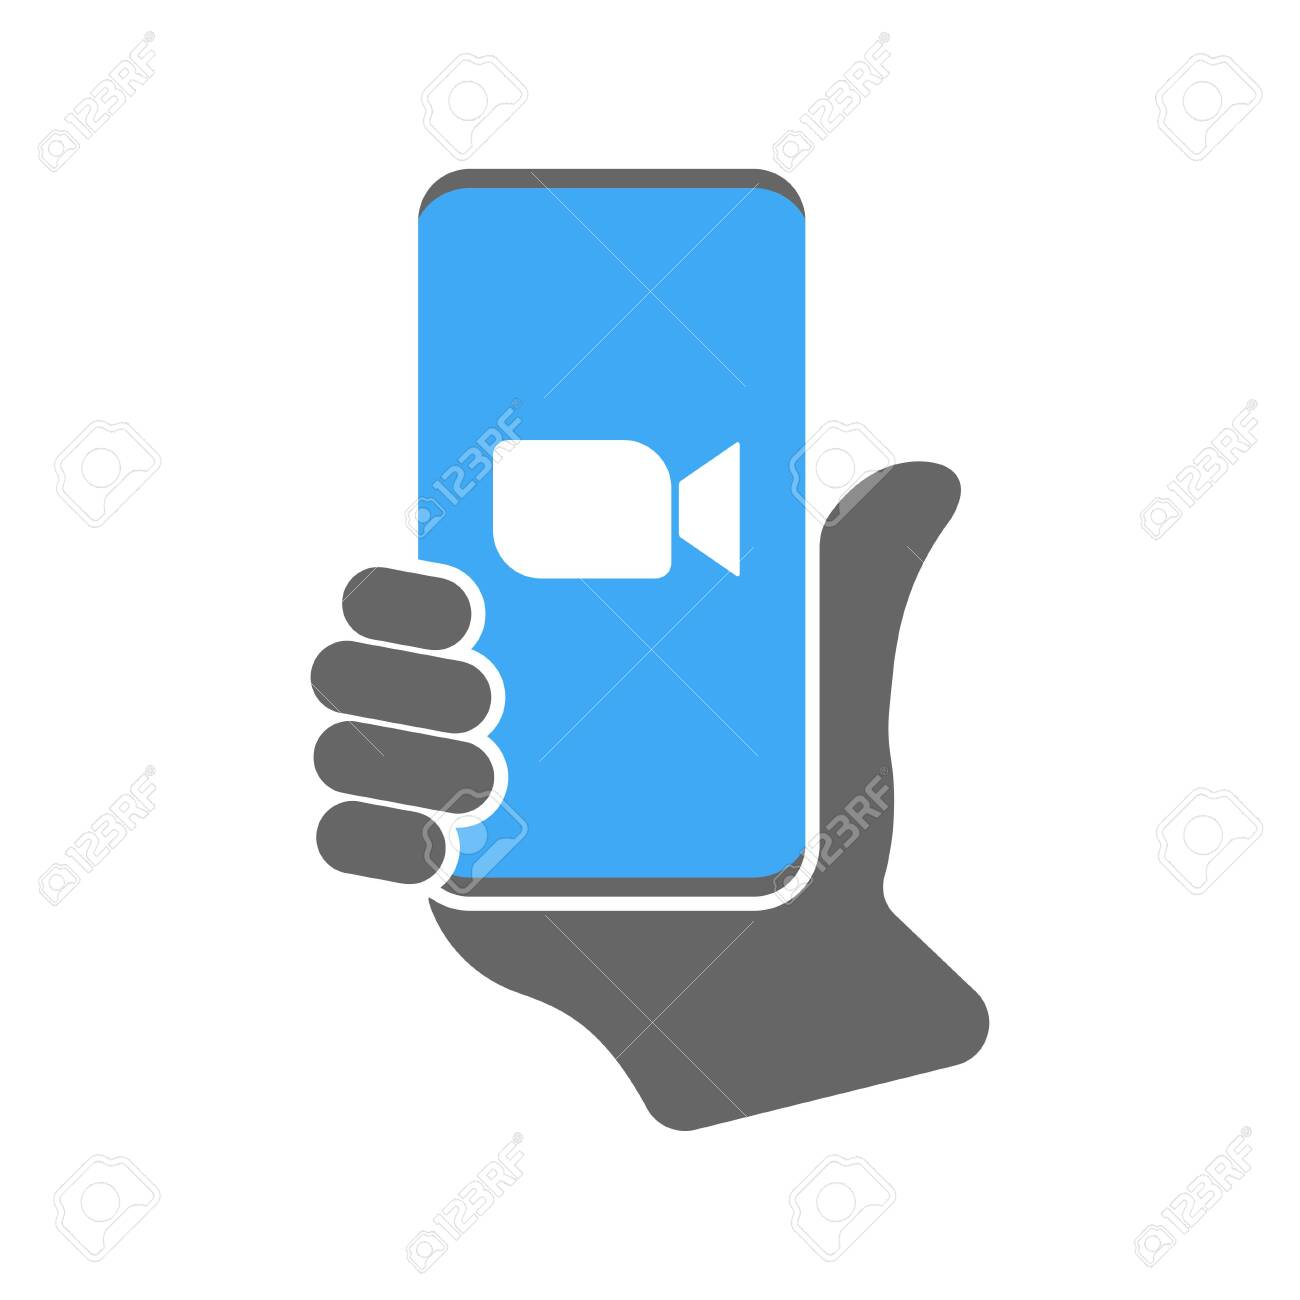 Camera icon on smartphone. Vector Illustration. EPS 10. - 145800171